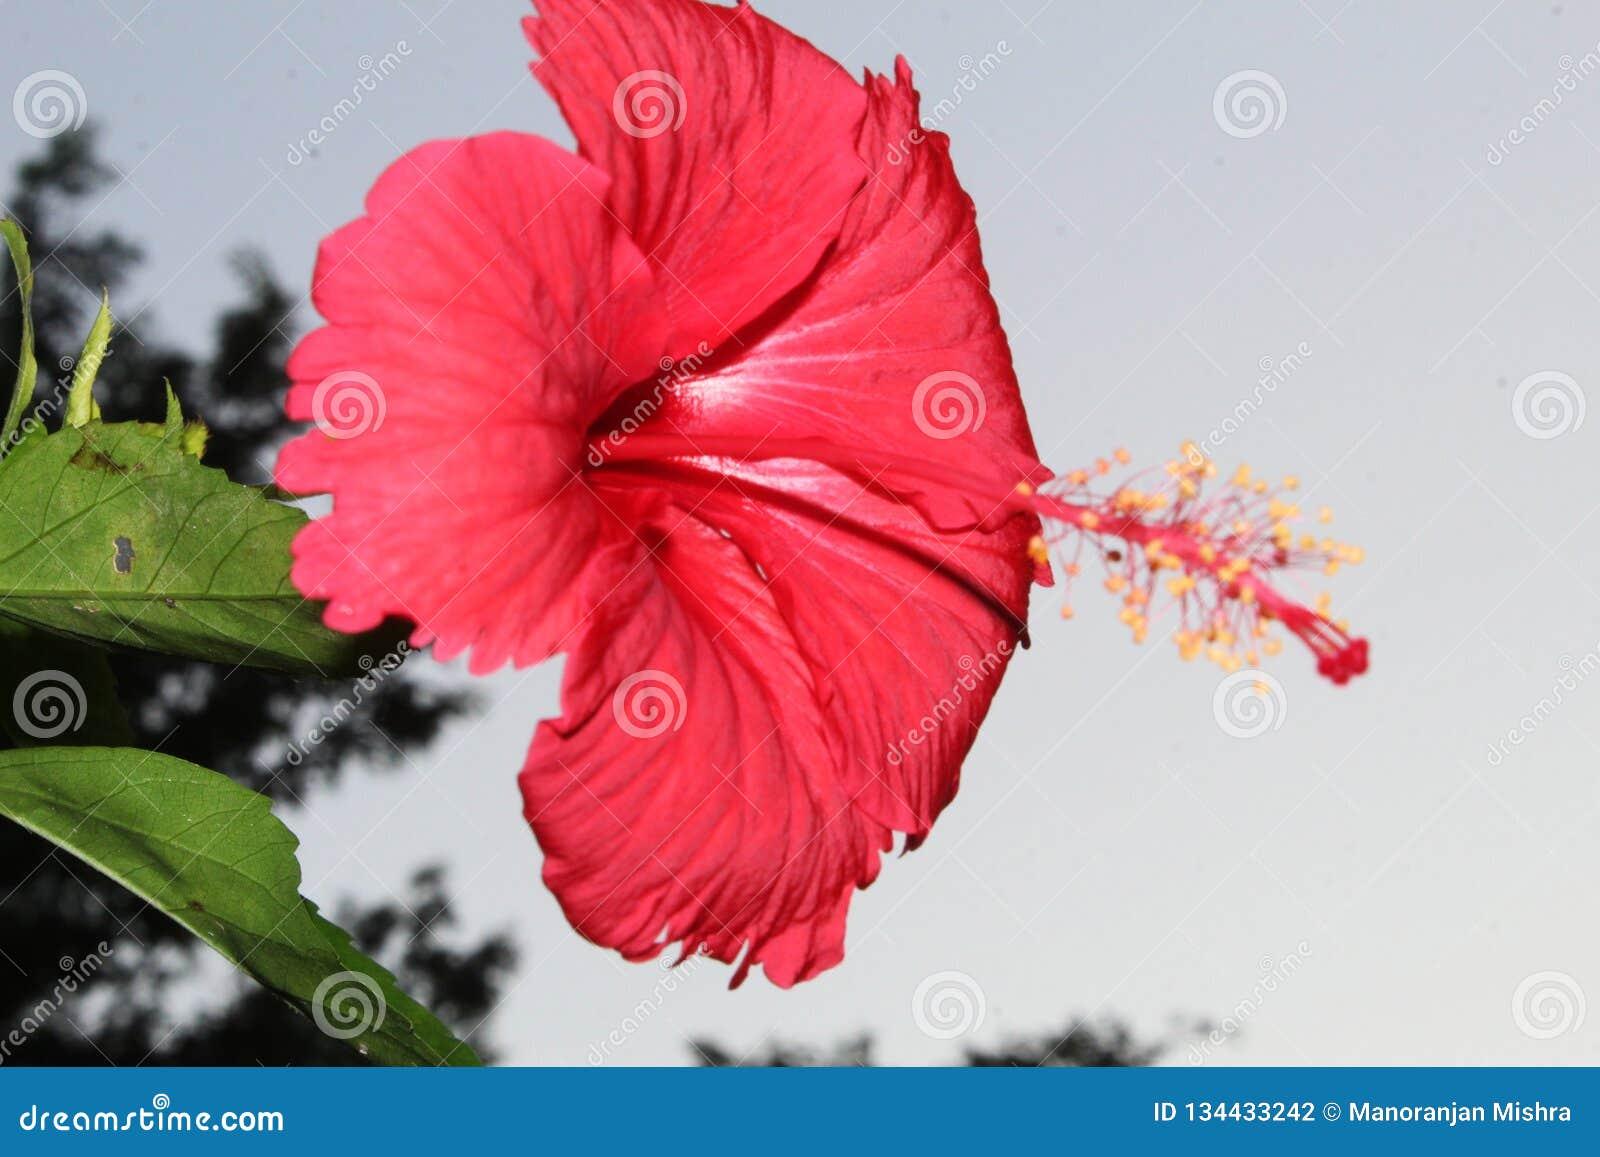 Beautiful up close of red hibiscus,hibiscus flower,hawaiian flowers,china rose,hibiscus plant,hibiscus tree